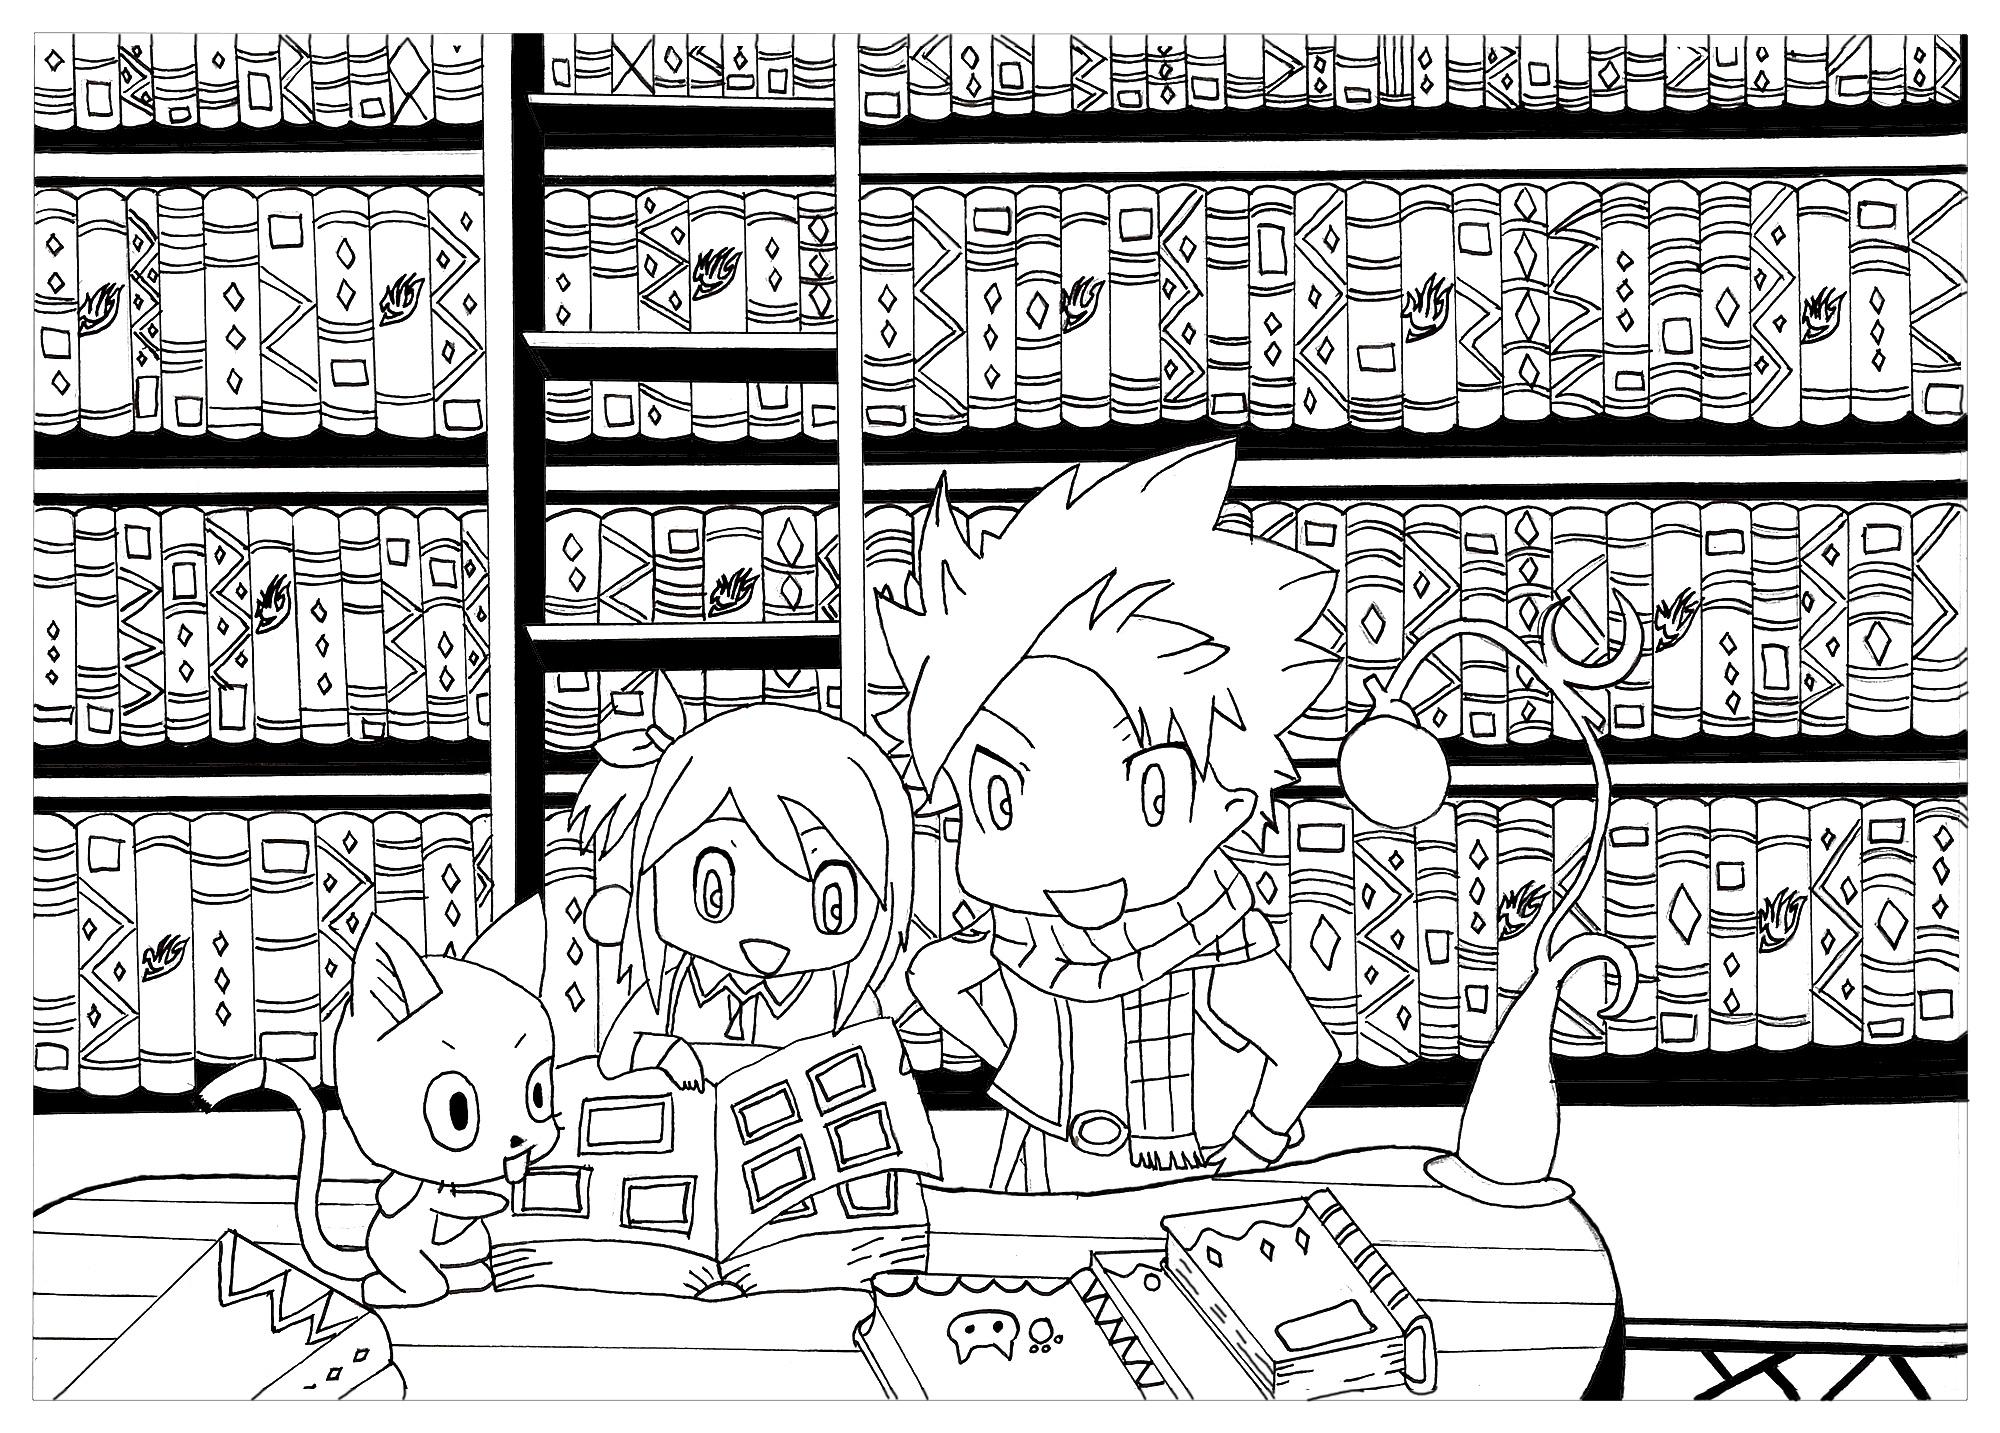 Mangas 19336 Mangas Colorear Para Adultos